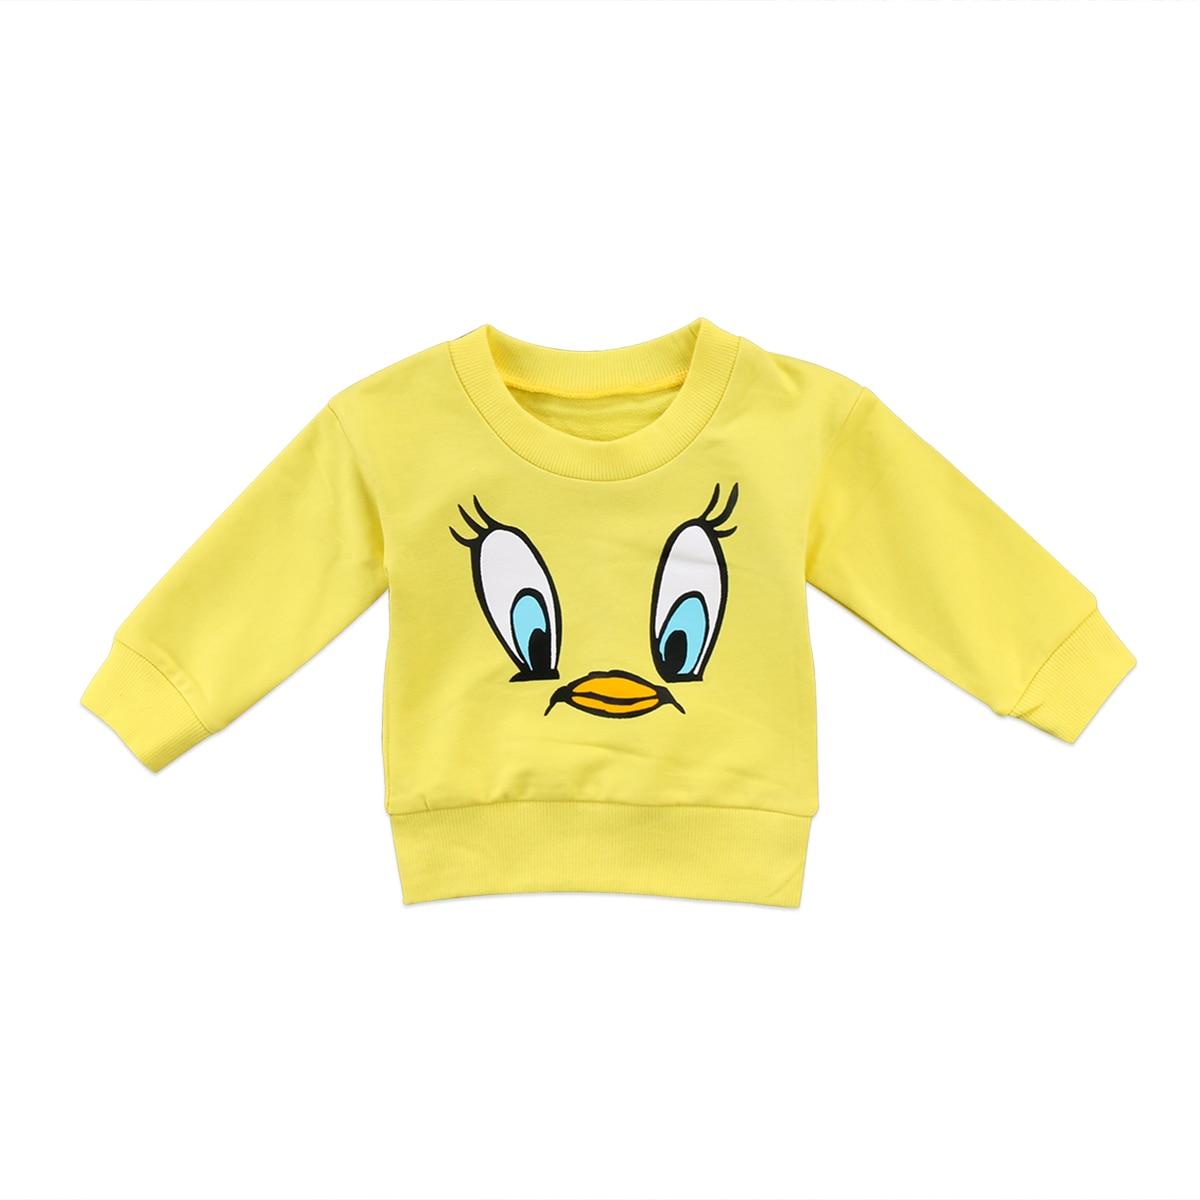 Fashion Toddler Children Kid Baby Girl Boy Casual Cartoon Tops Sweatshirts Hoodies 2018 New Clothes